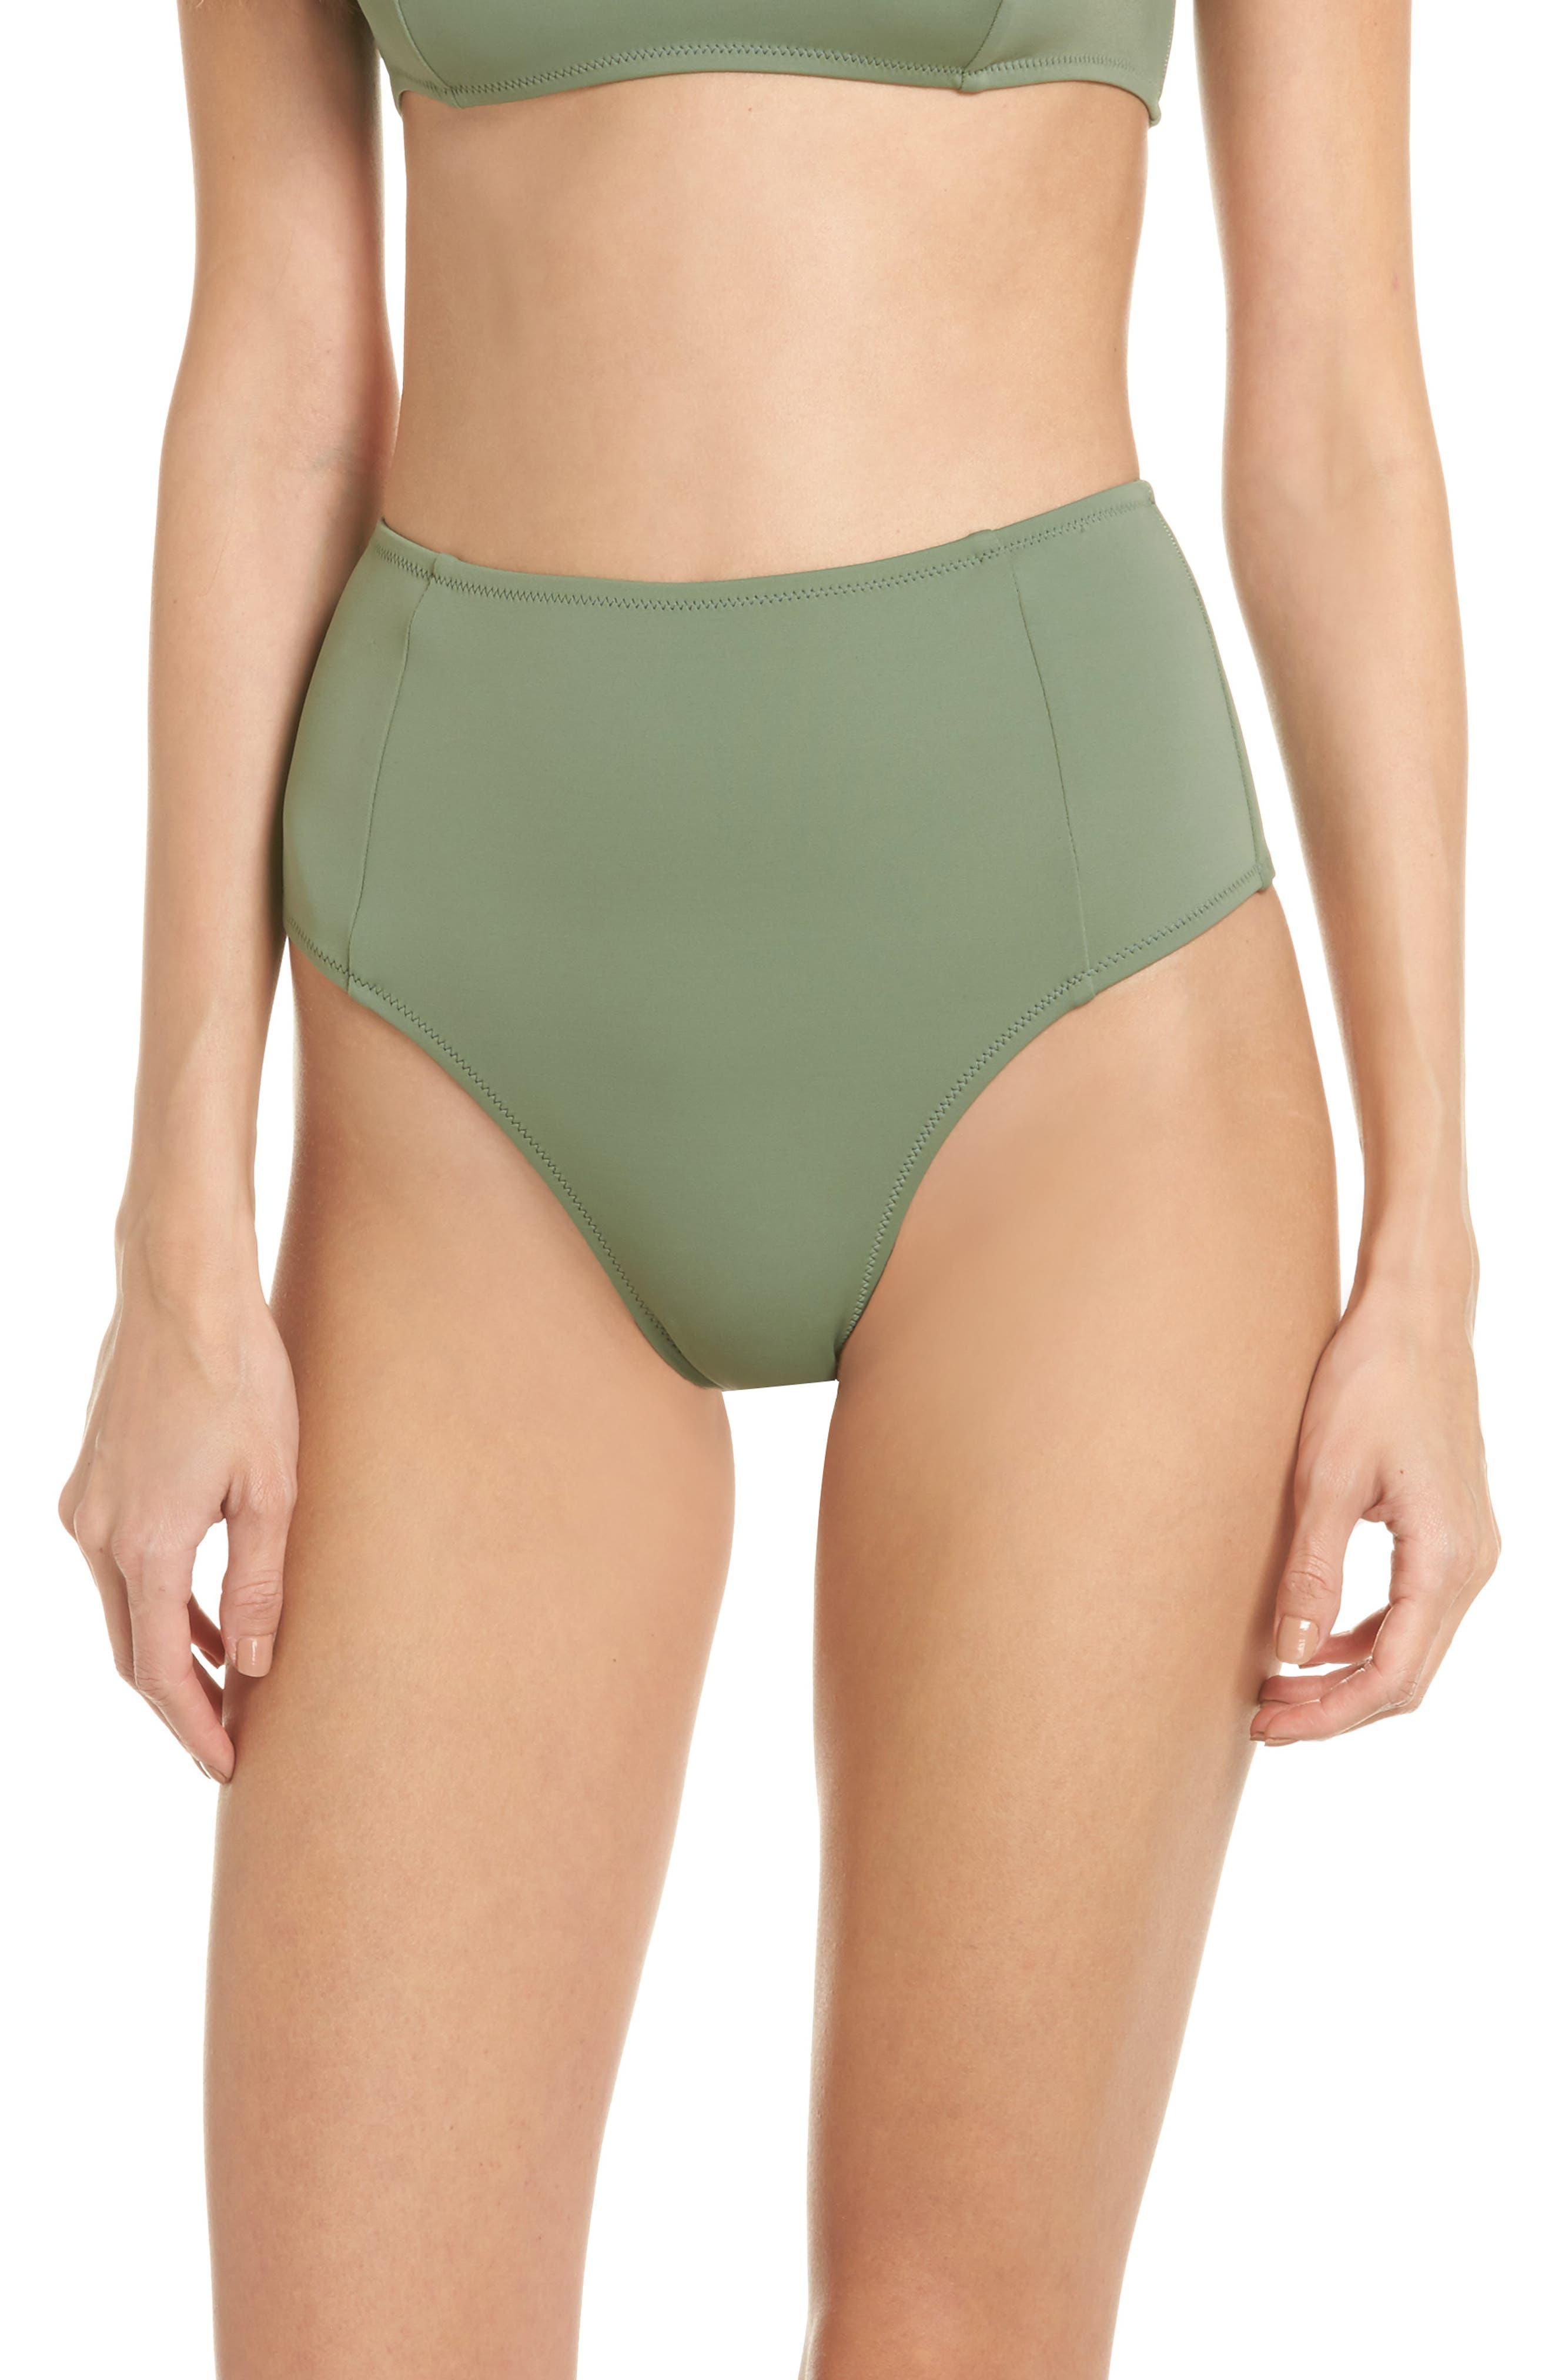 Solid & Striped The Jessica High Waist Bikini Bottoms